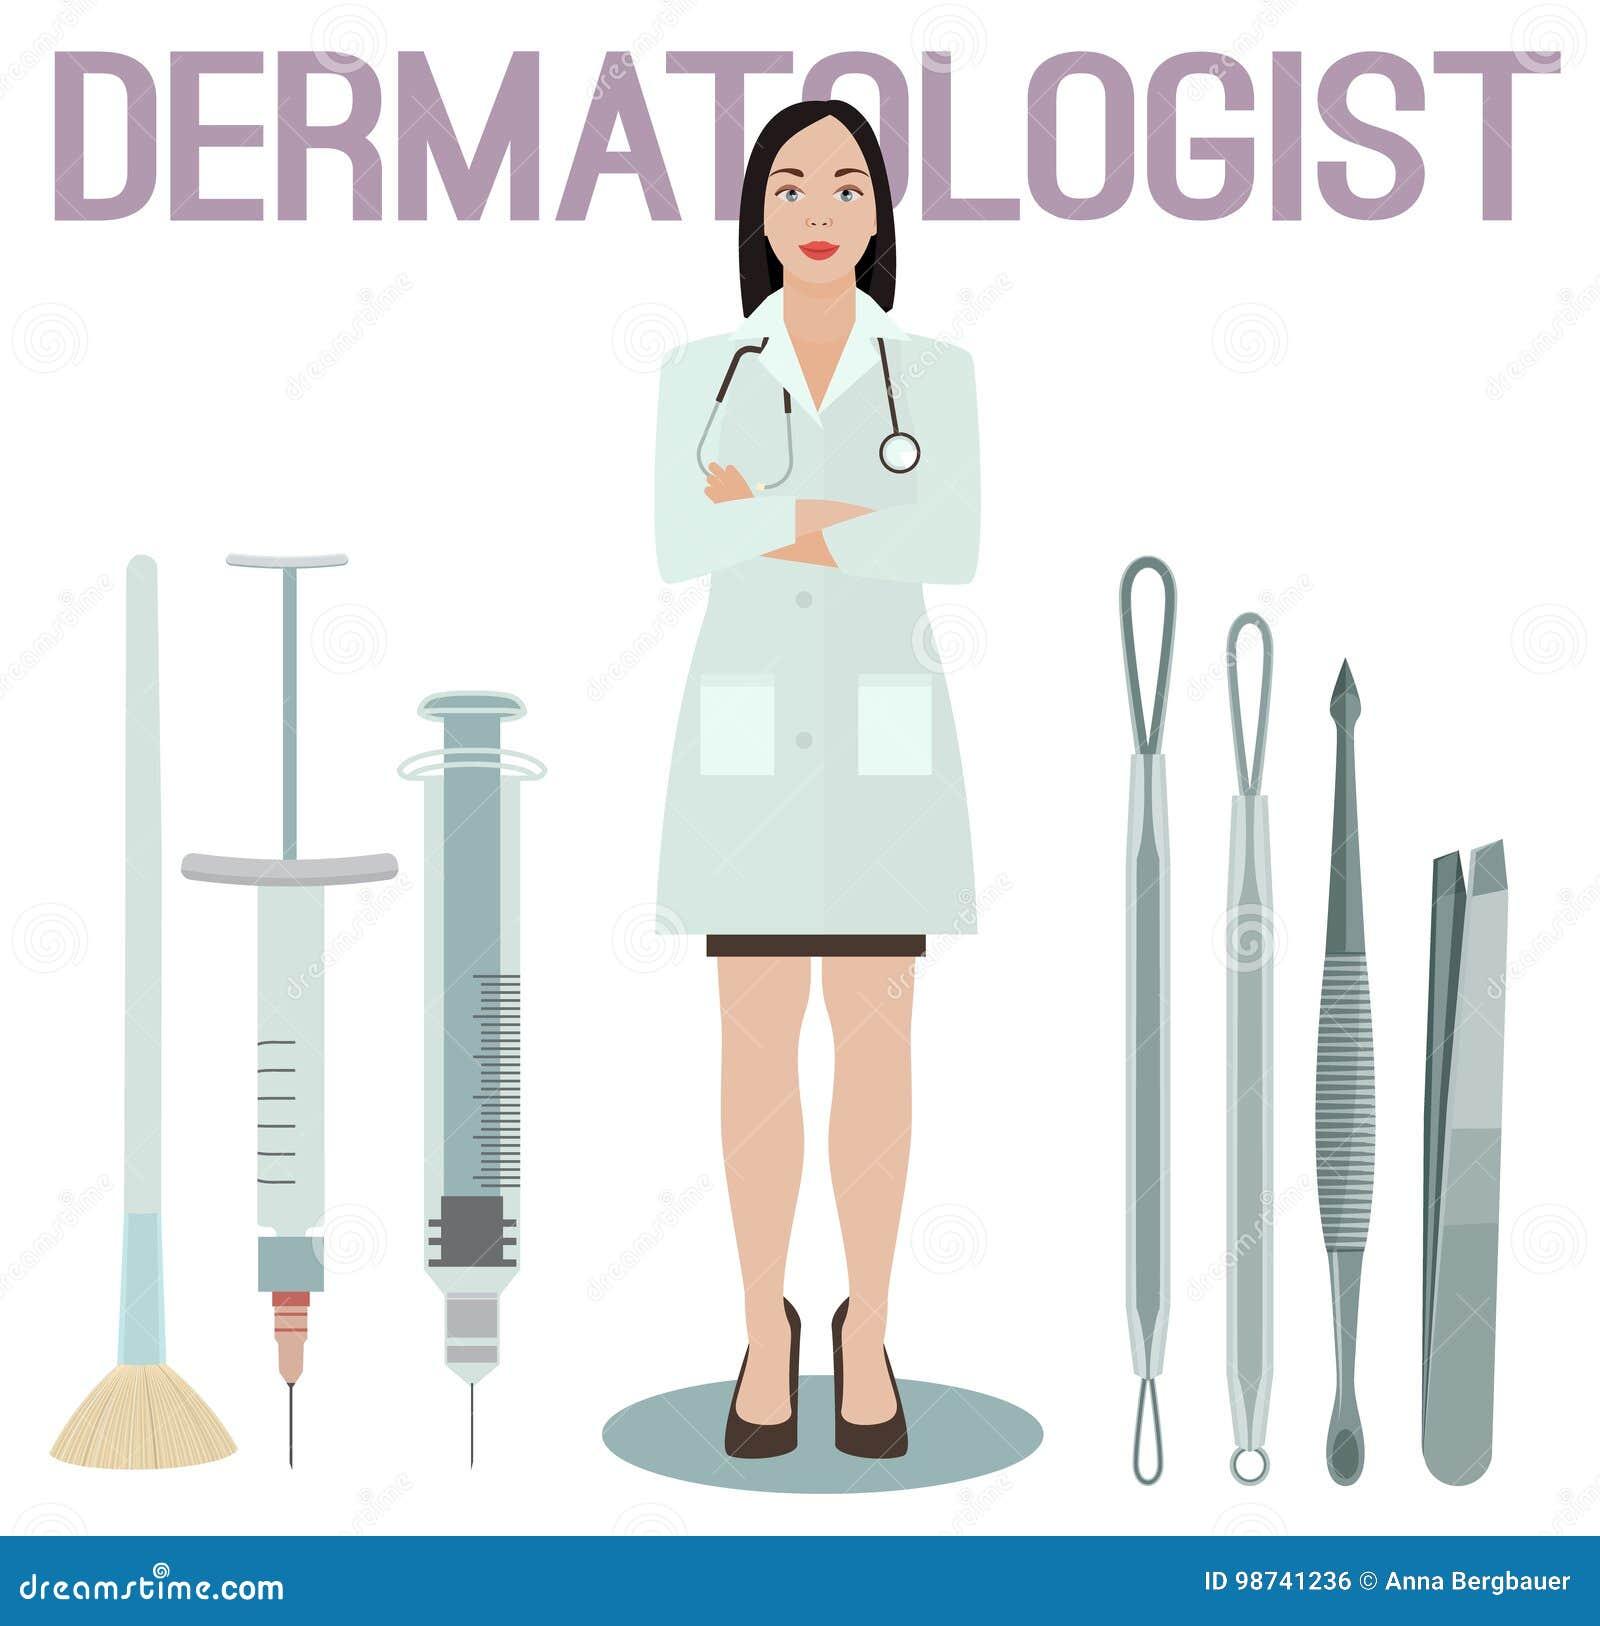 Dermatology: Esthetician Cartoons, Illustrations & Vector Stock Images